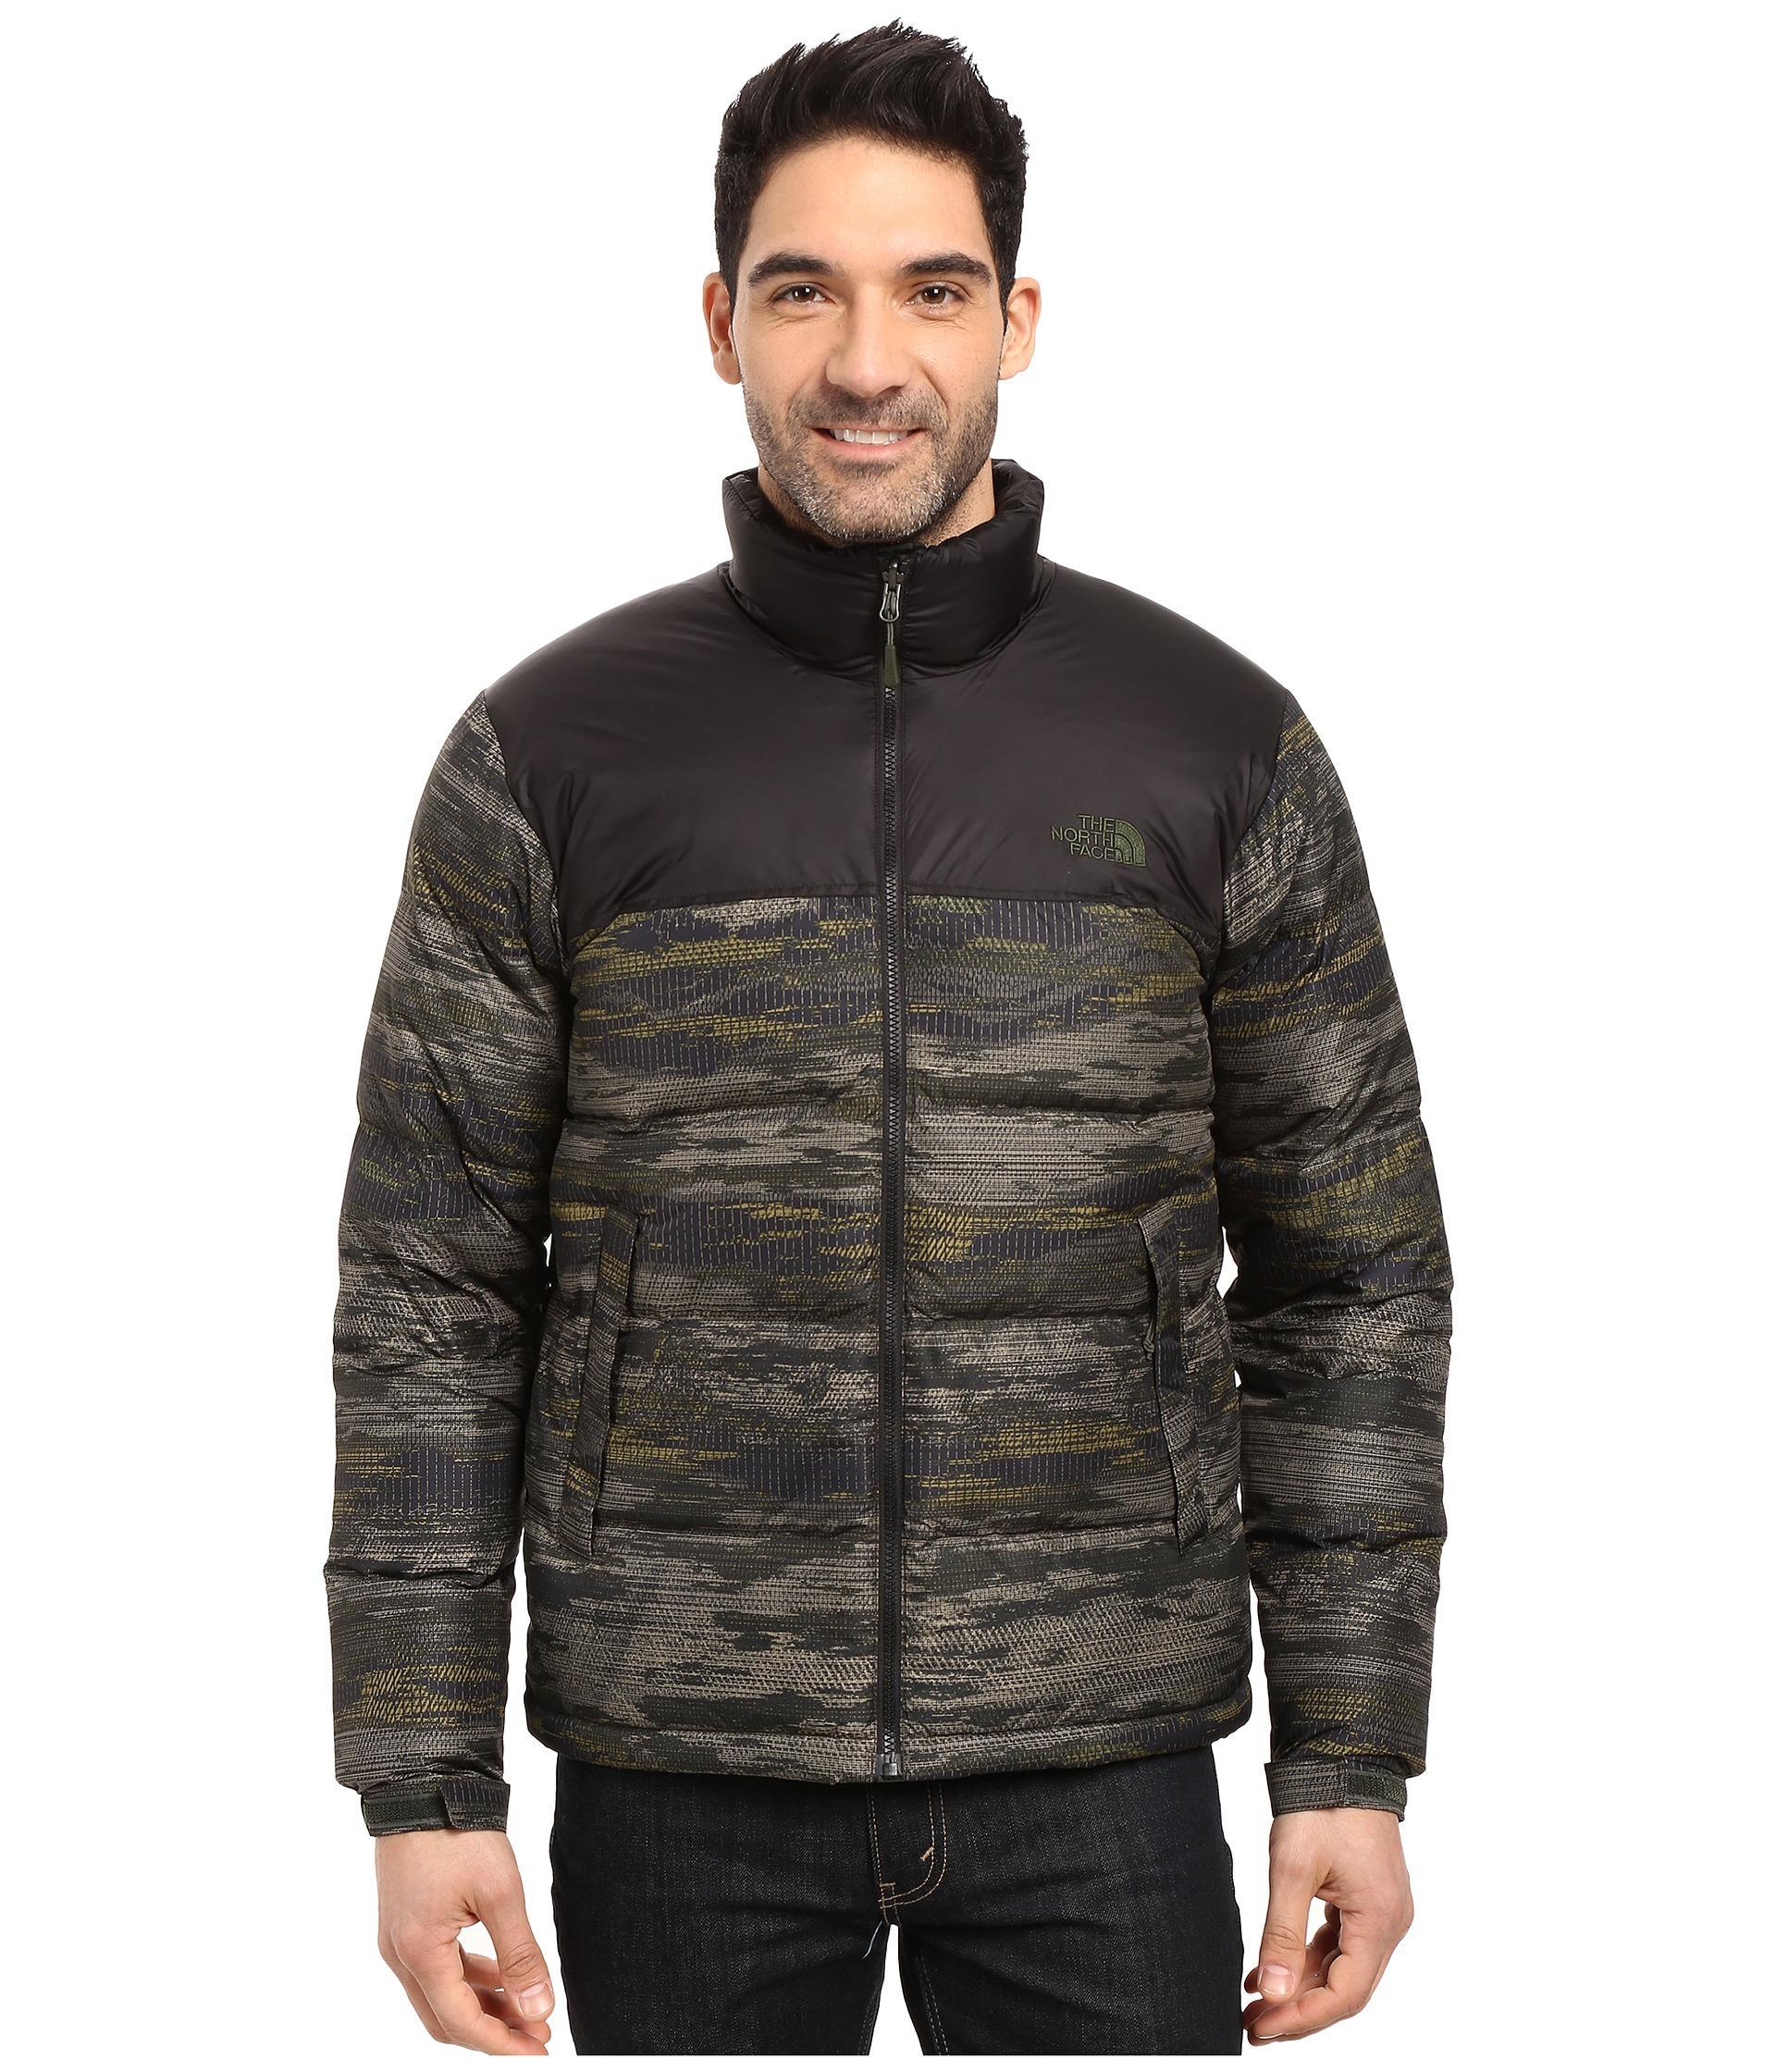 9fc881f3de1 Nuptse Jacket for Men Lyst. View Fullscreen . tnfaw16jacket2 tnfaw16jacket1  tnfaw16jacket23 tnfaw16jacket25 tnfaw16jacket24 Nuptse 2 Jacket Black Ink  Green ...